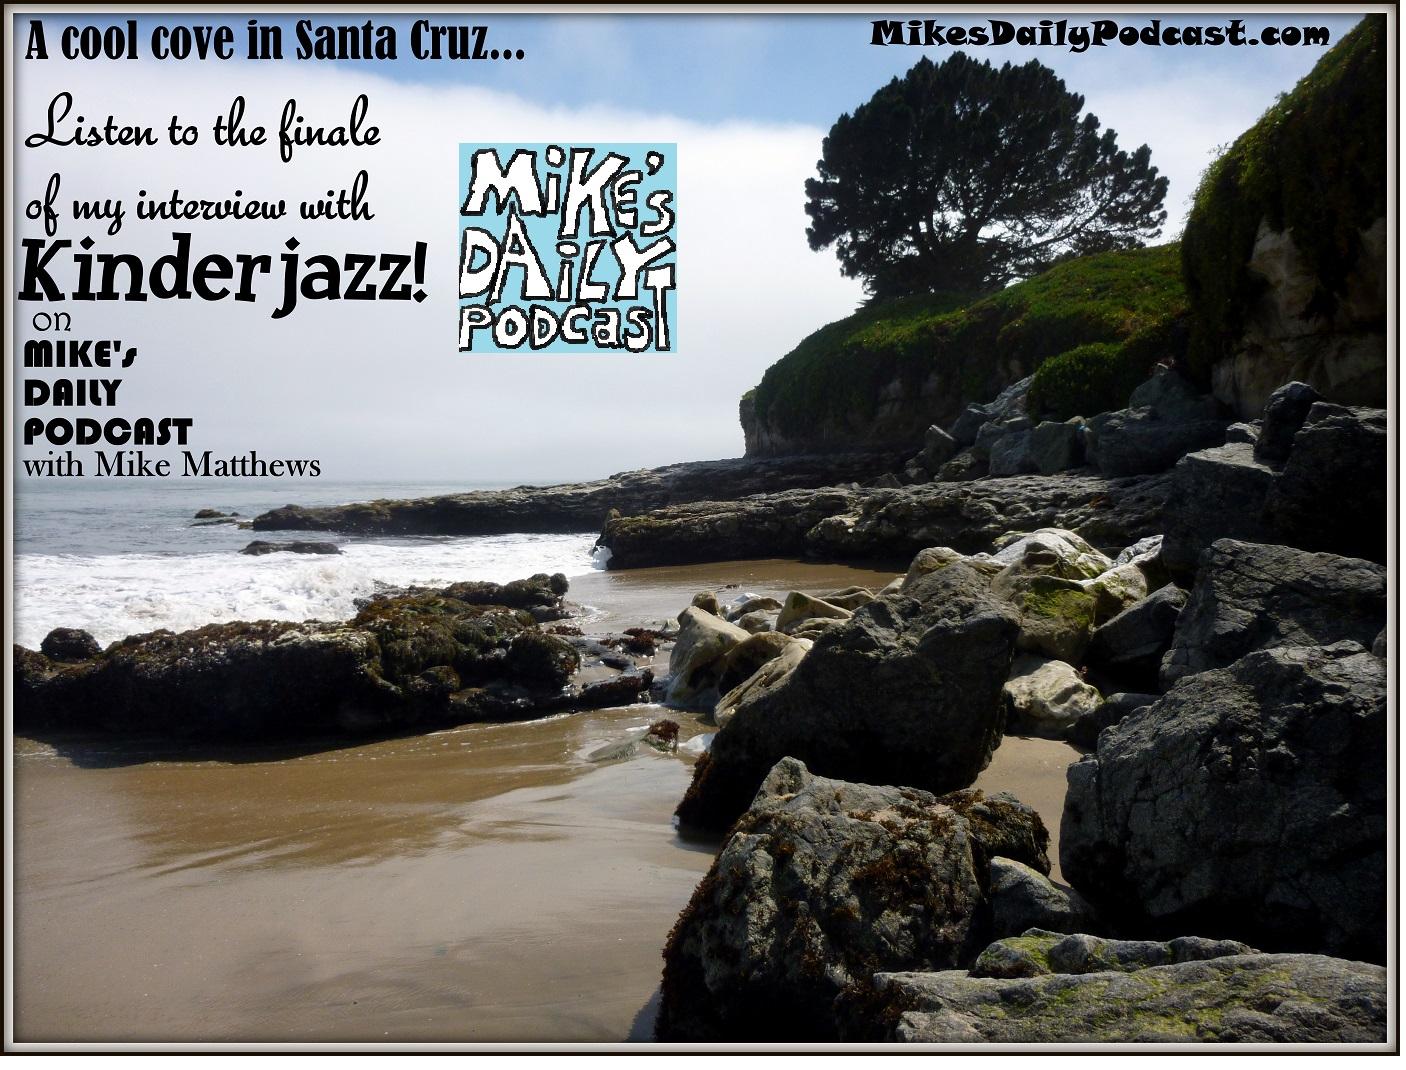 MIKEs DAILY PODCAST 1019 Santa Cruz beach